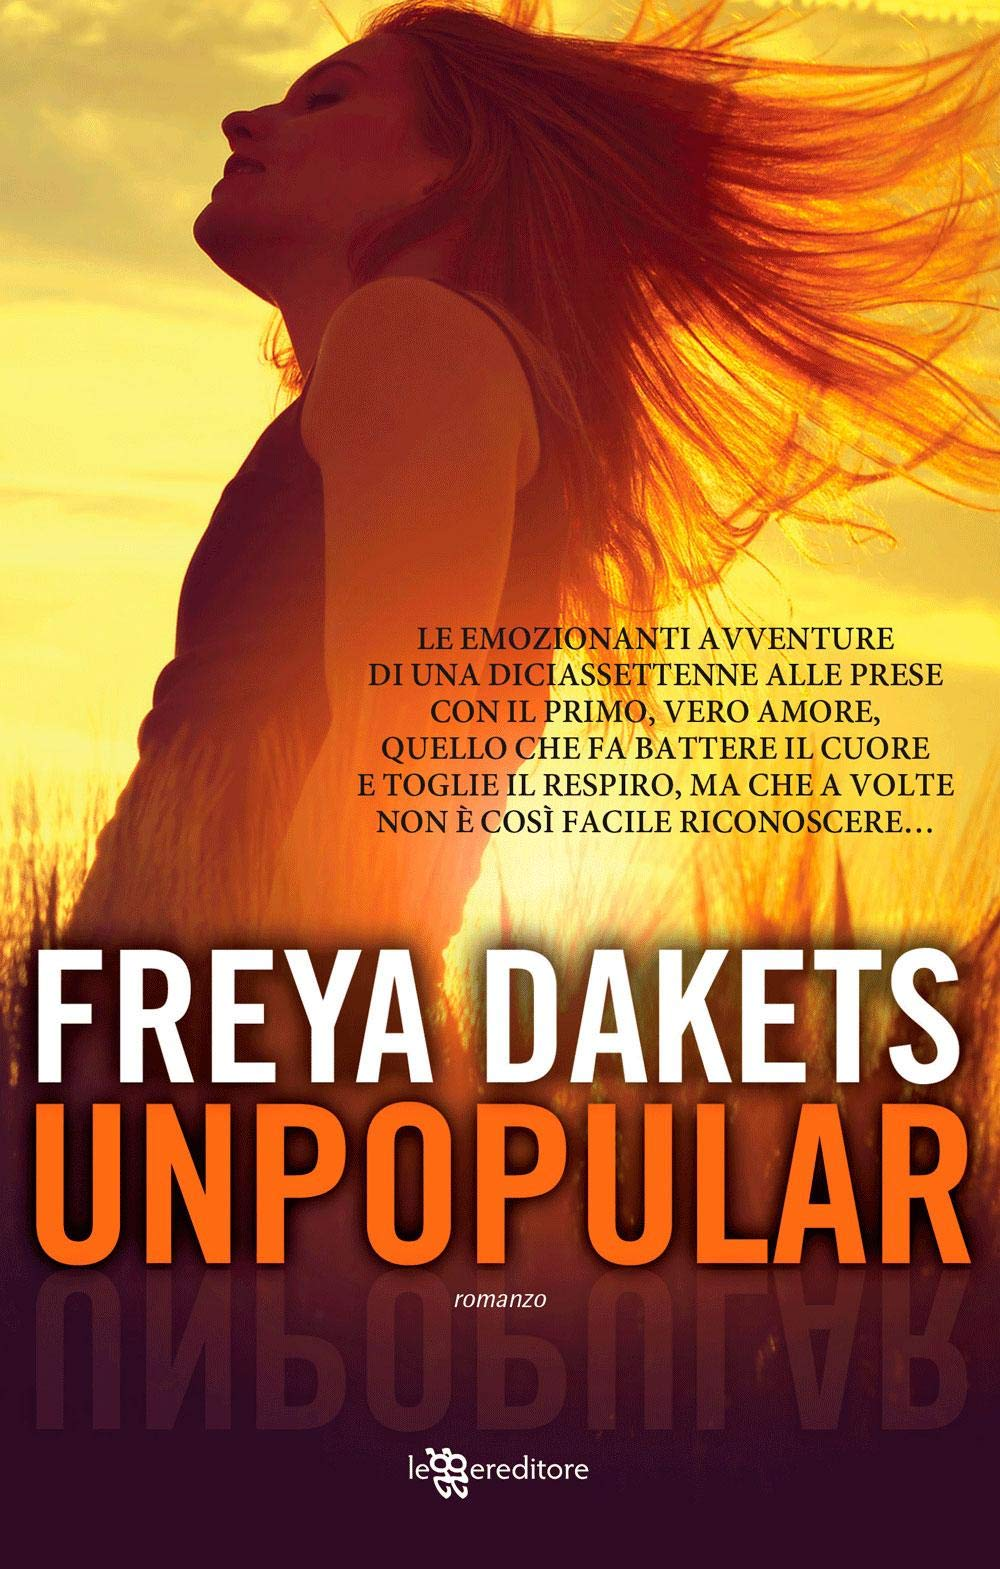 Unpopular: Amazon.it: Dakets, Freya: Libri